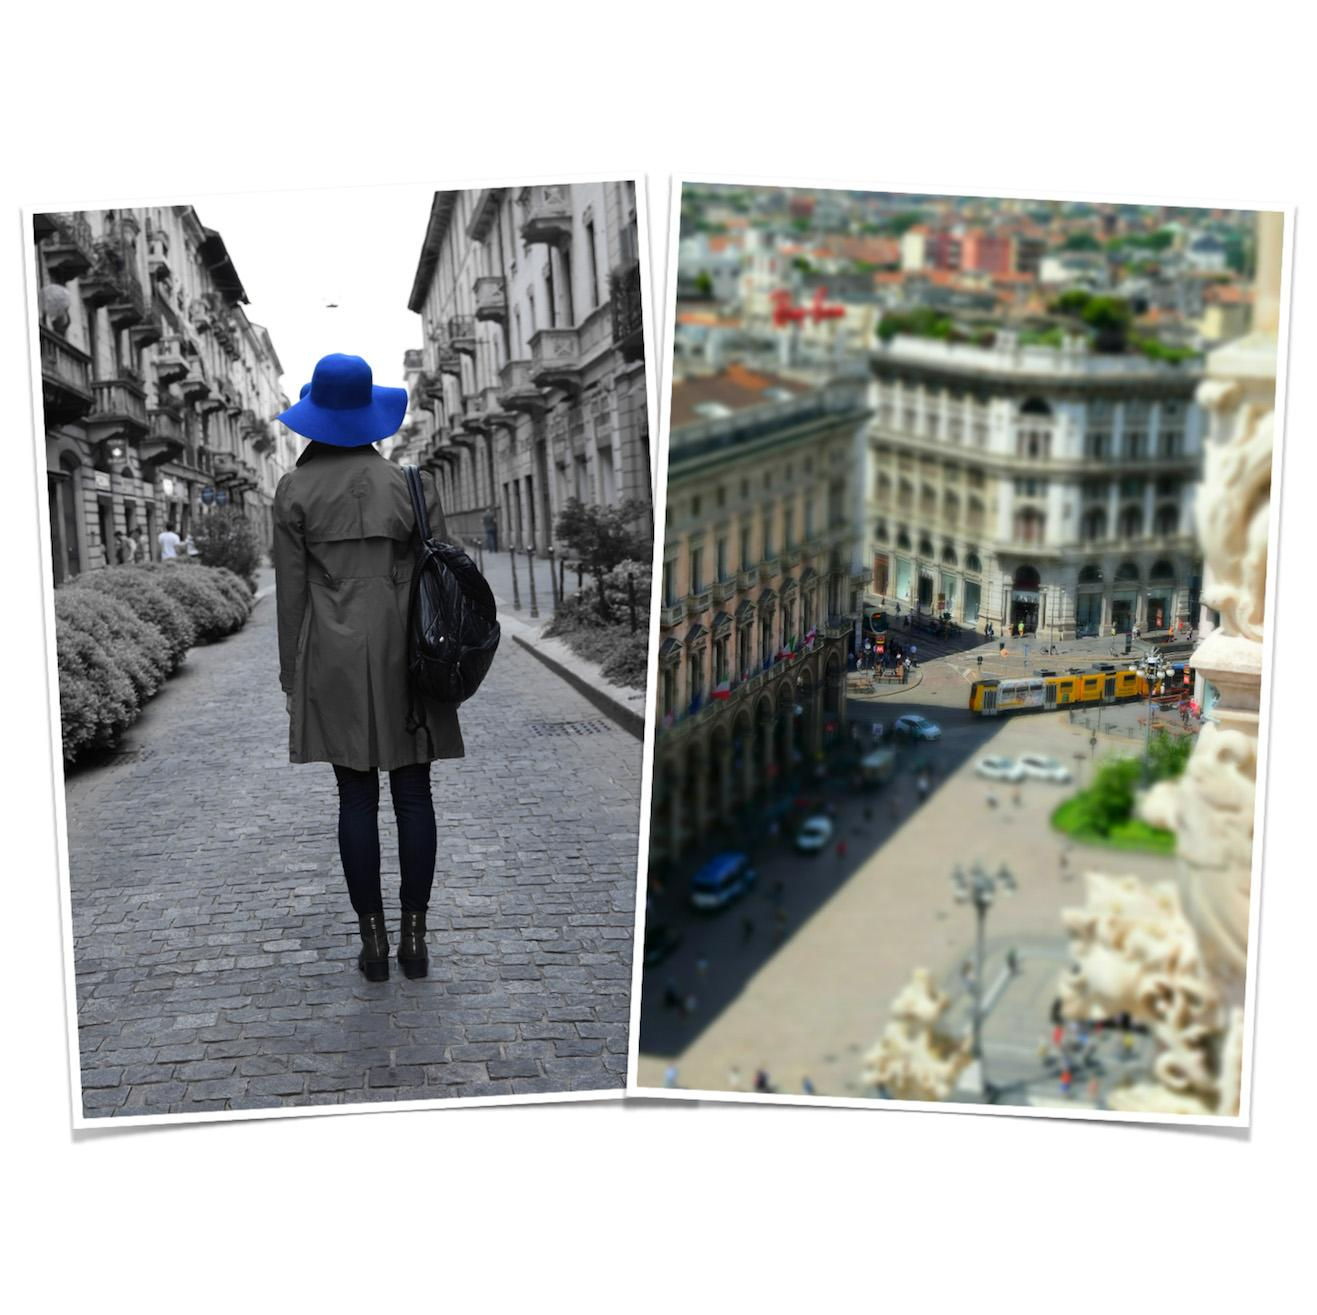 Kreative Effekt-Modi und Bildbearbeitung